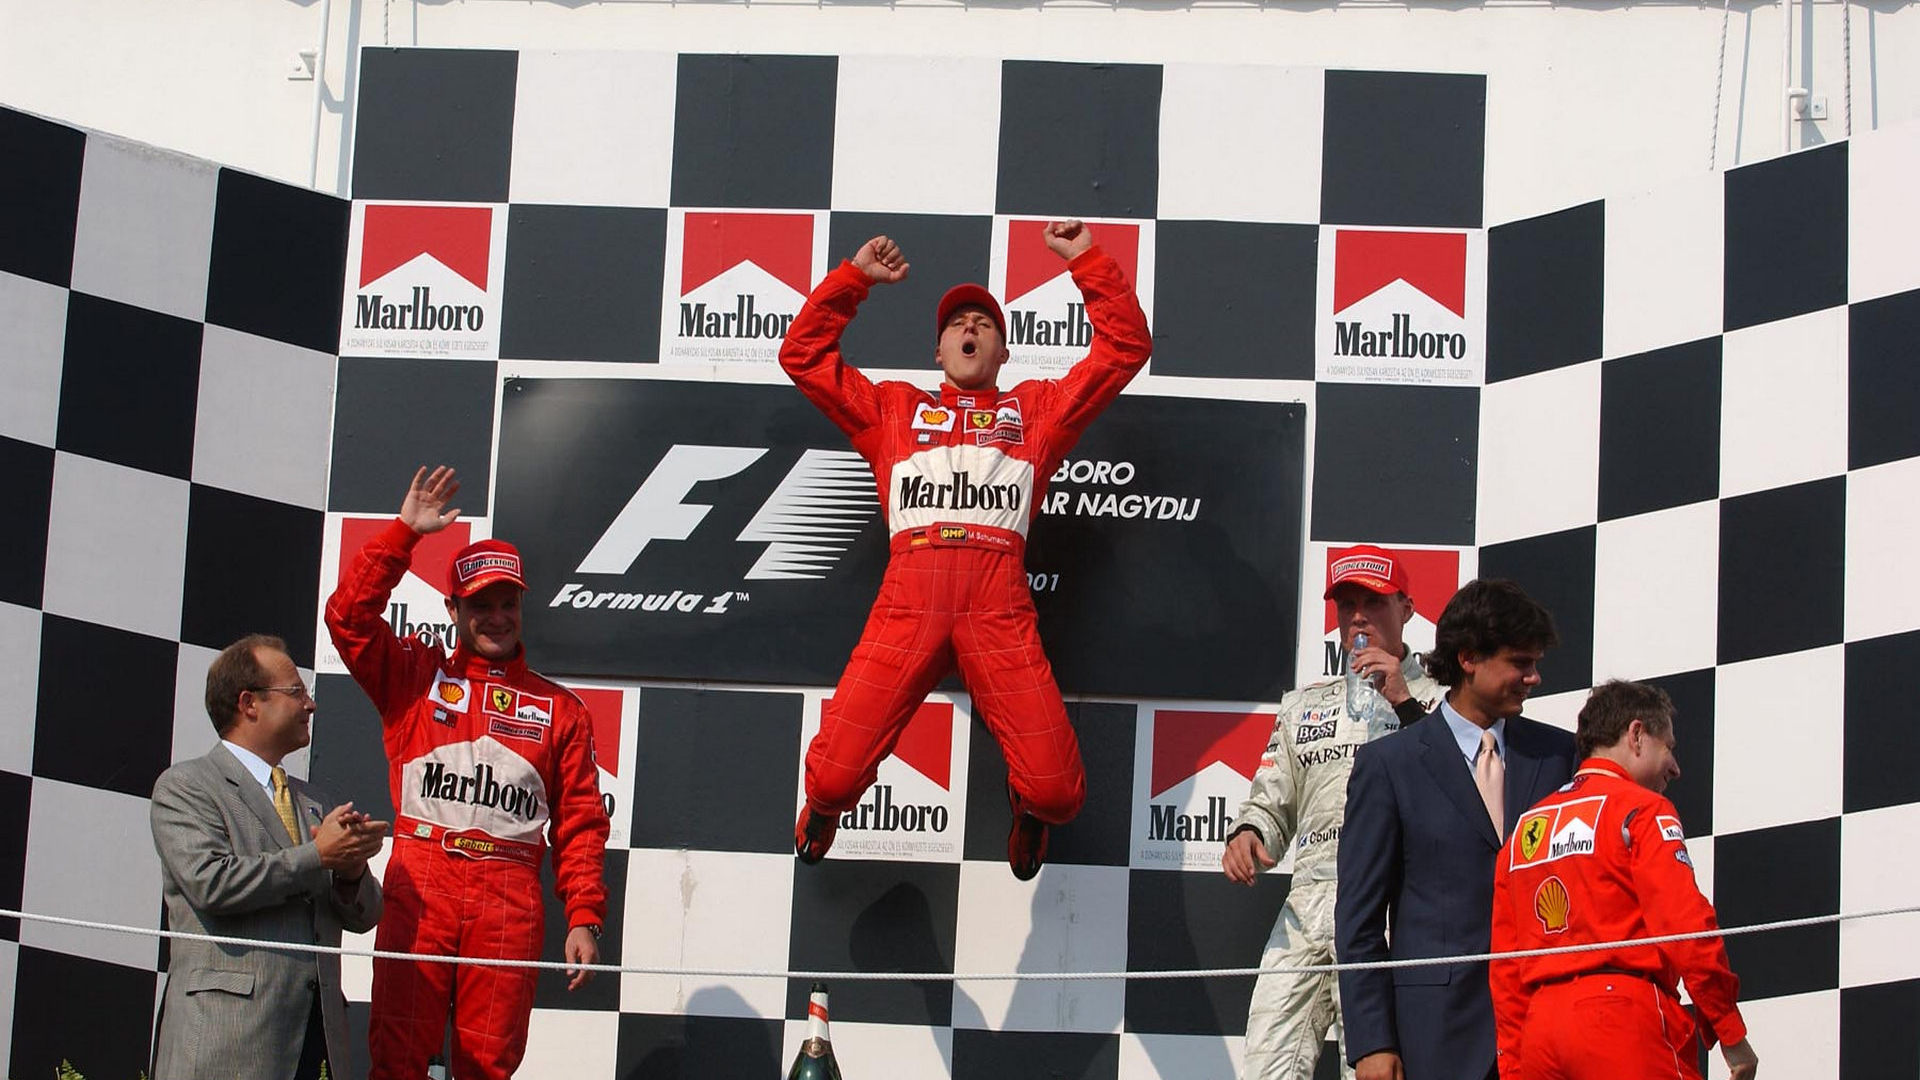 Prima Tour In A McLaren Ferrari amp Ford  Speedhunters